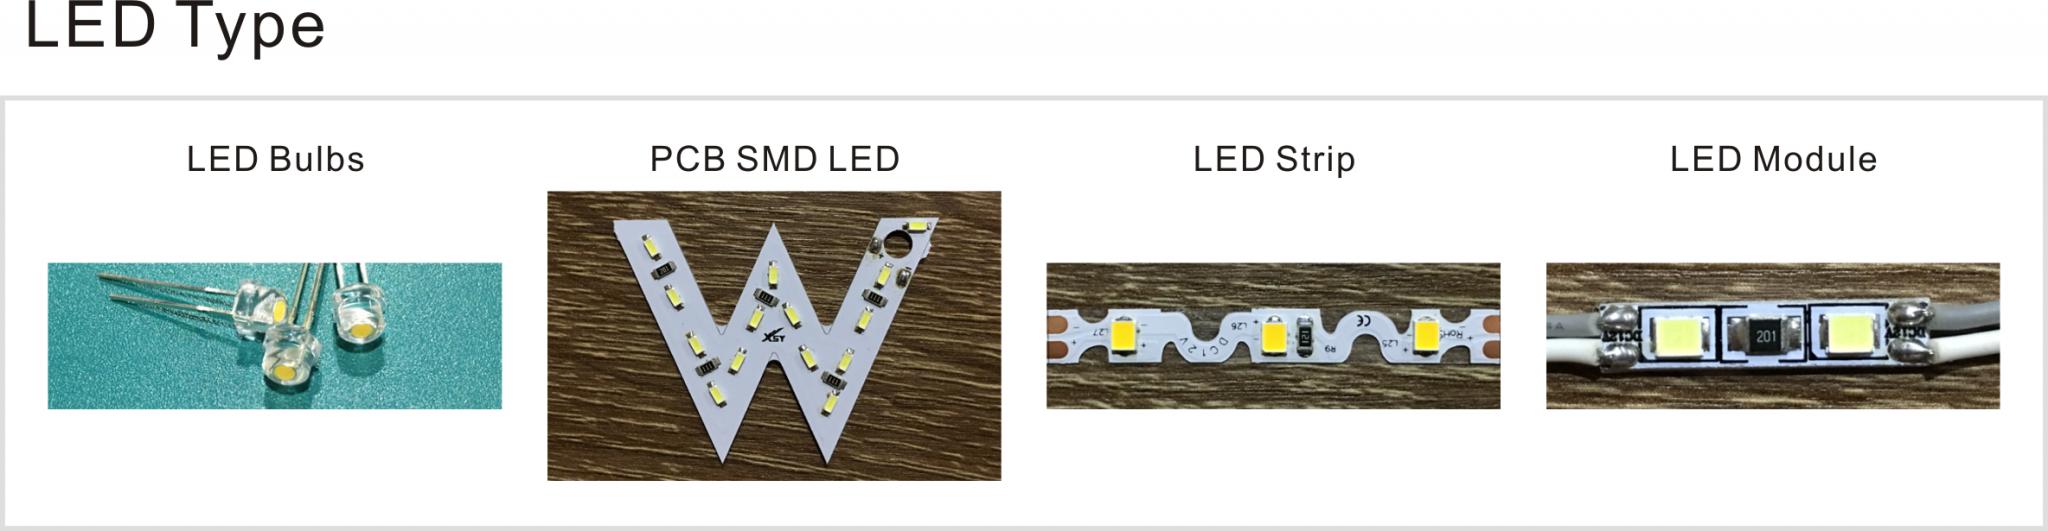 M01-13